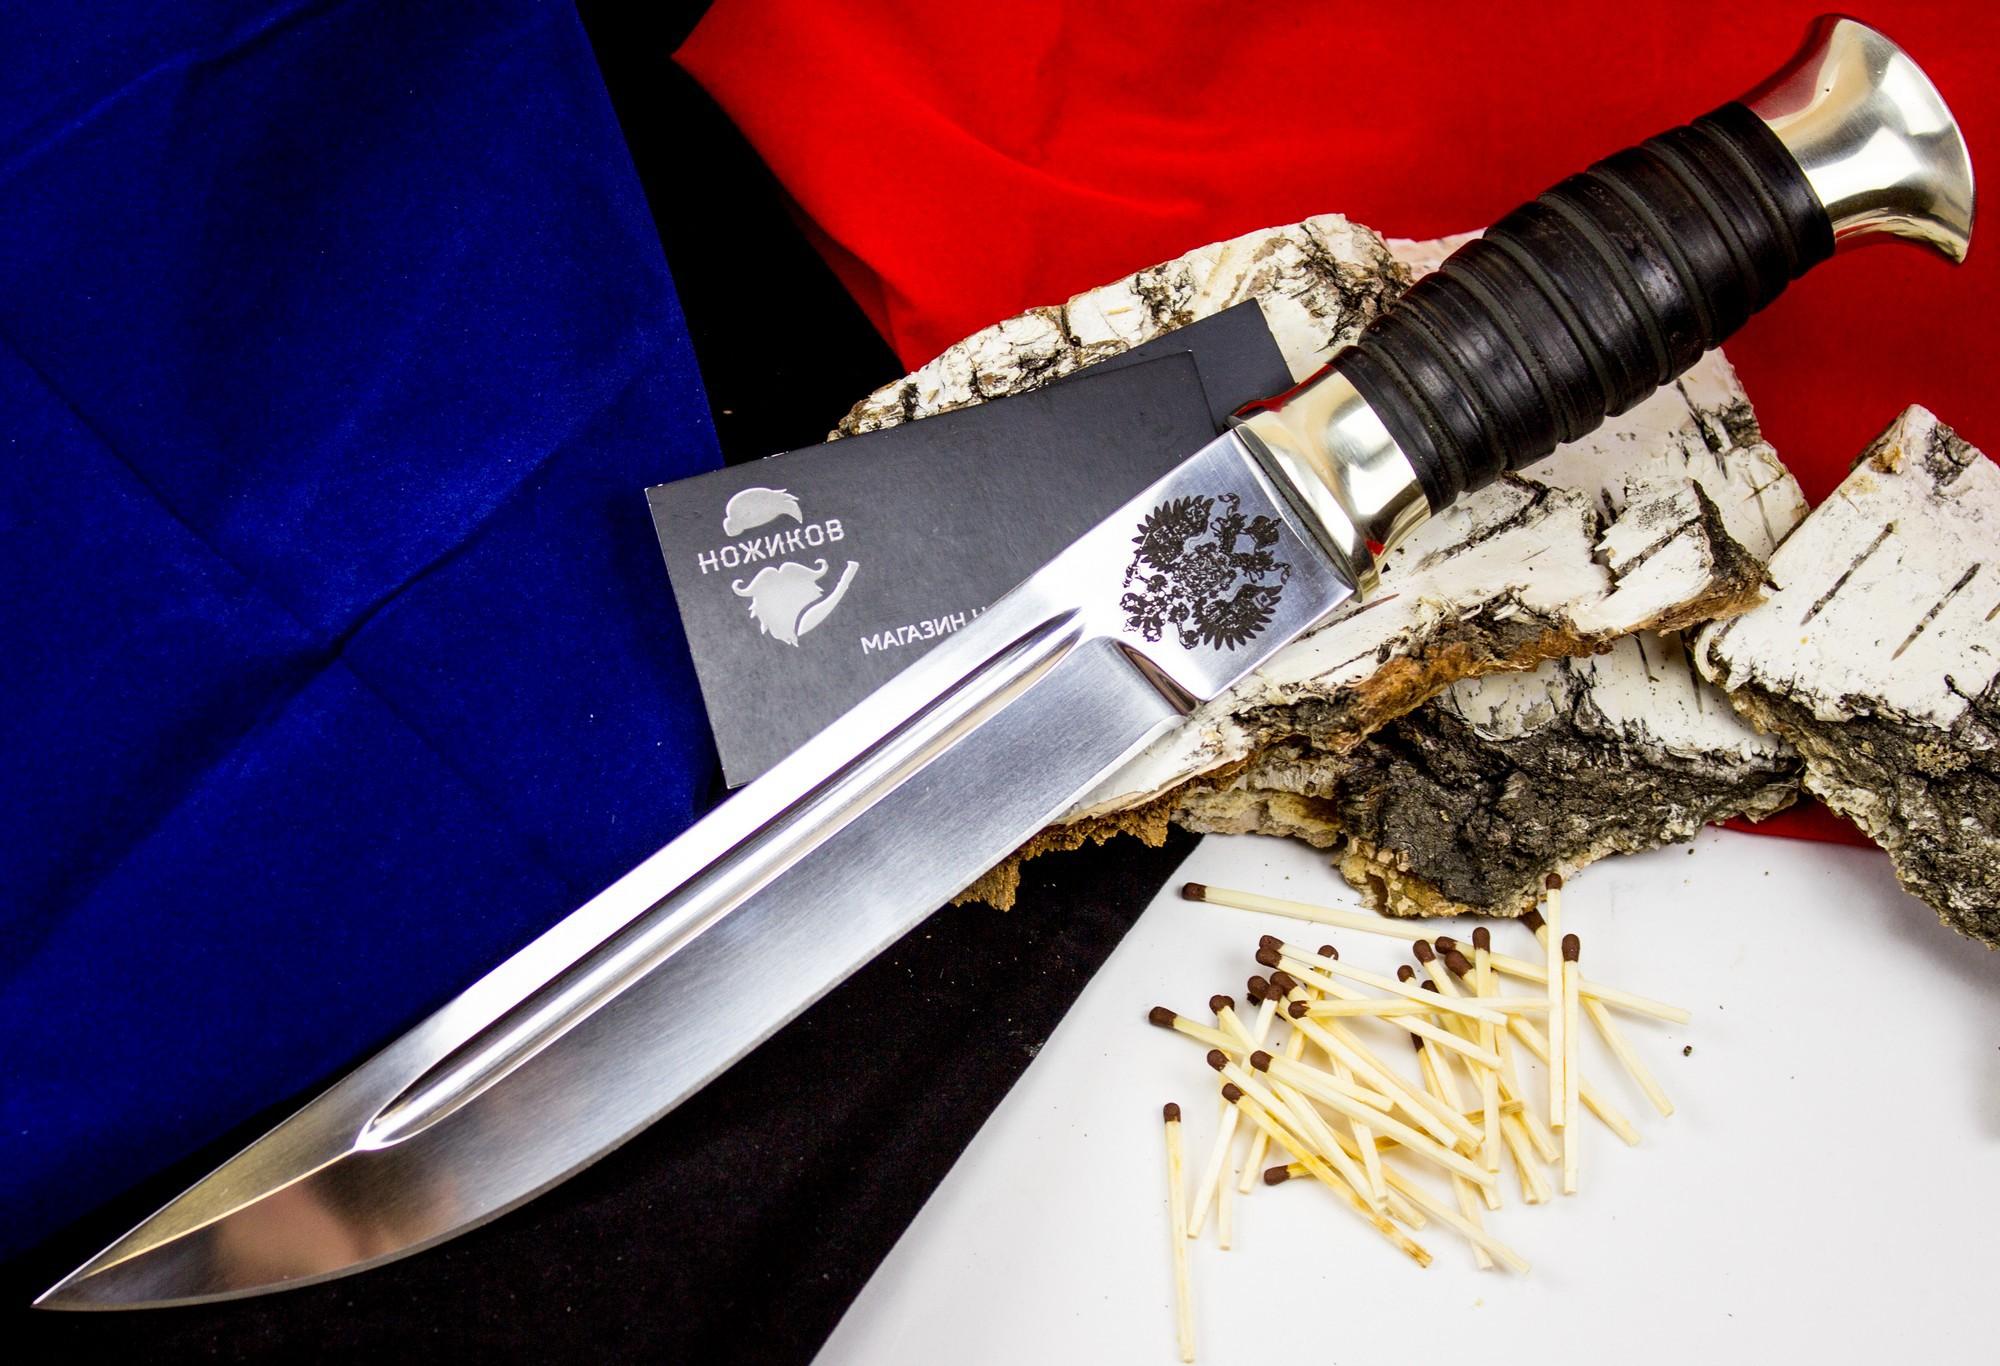 Пластунский кованый нож Казак, Х12МФ, мельхиор от Кузница Семина